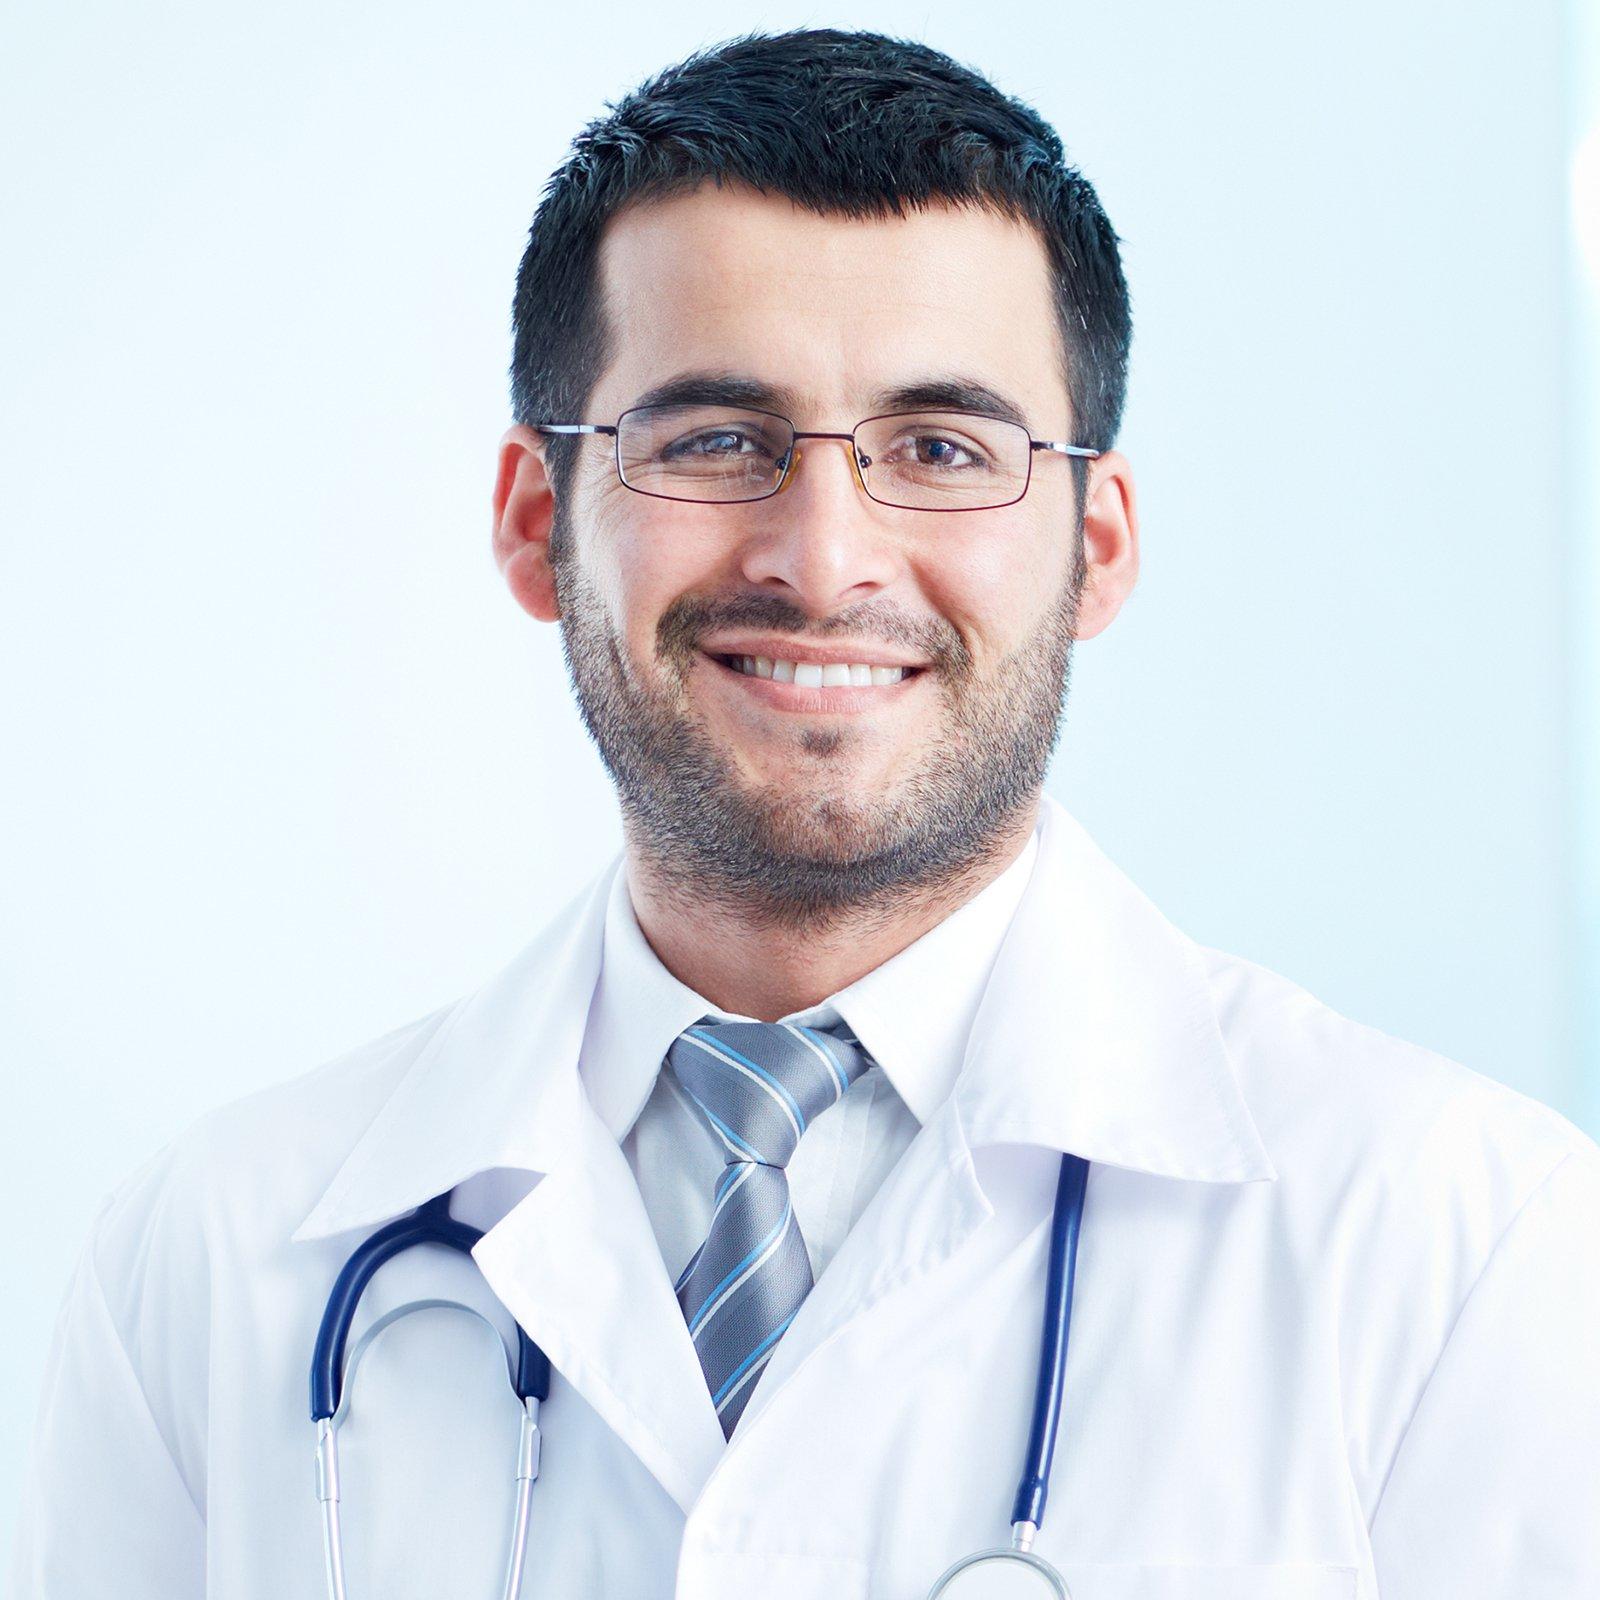 Successful physician